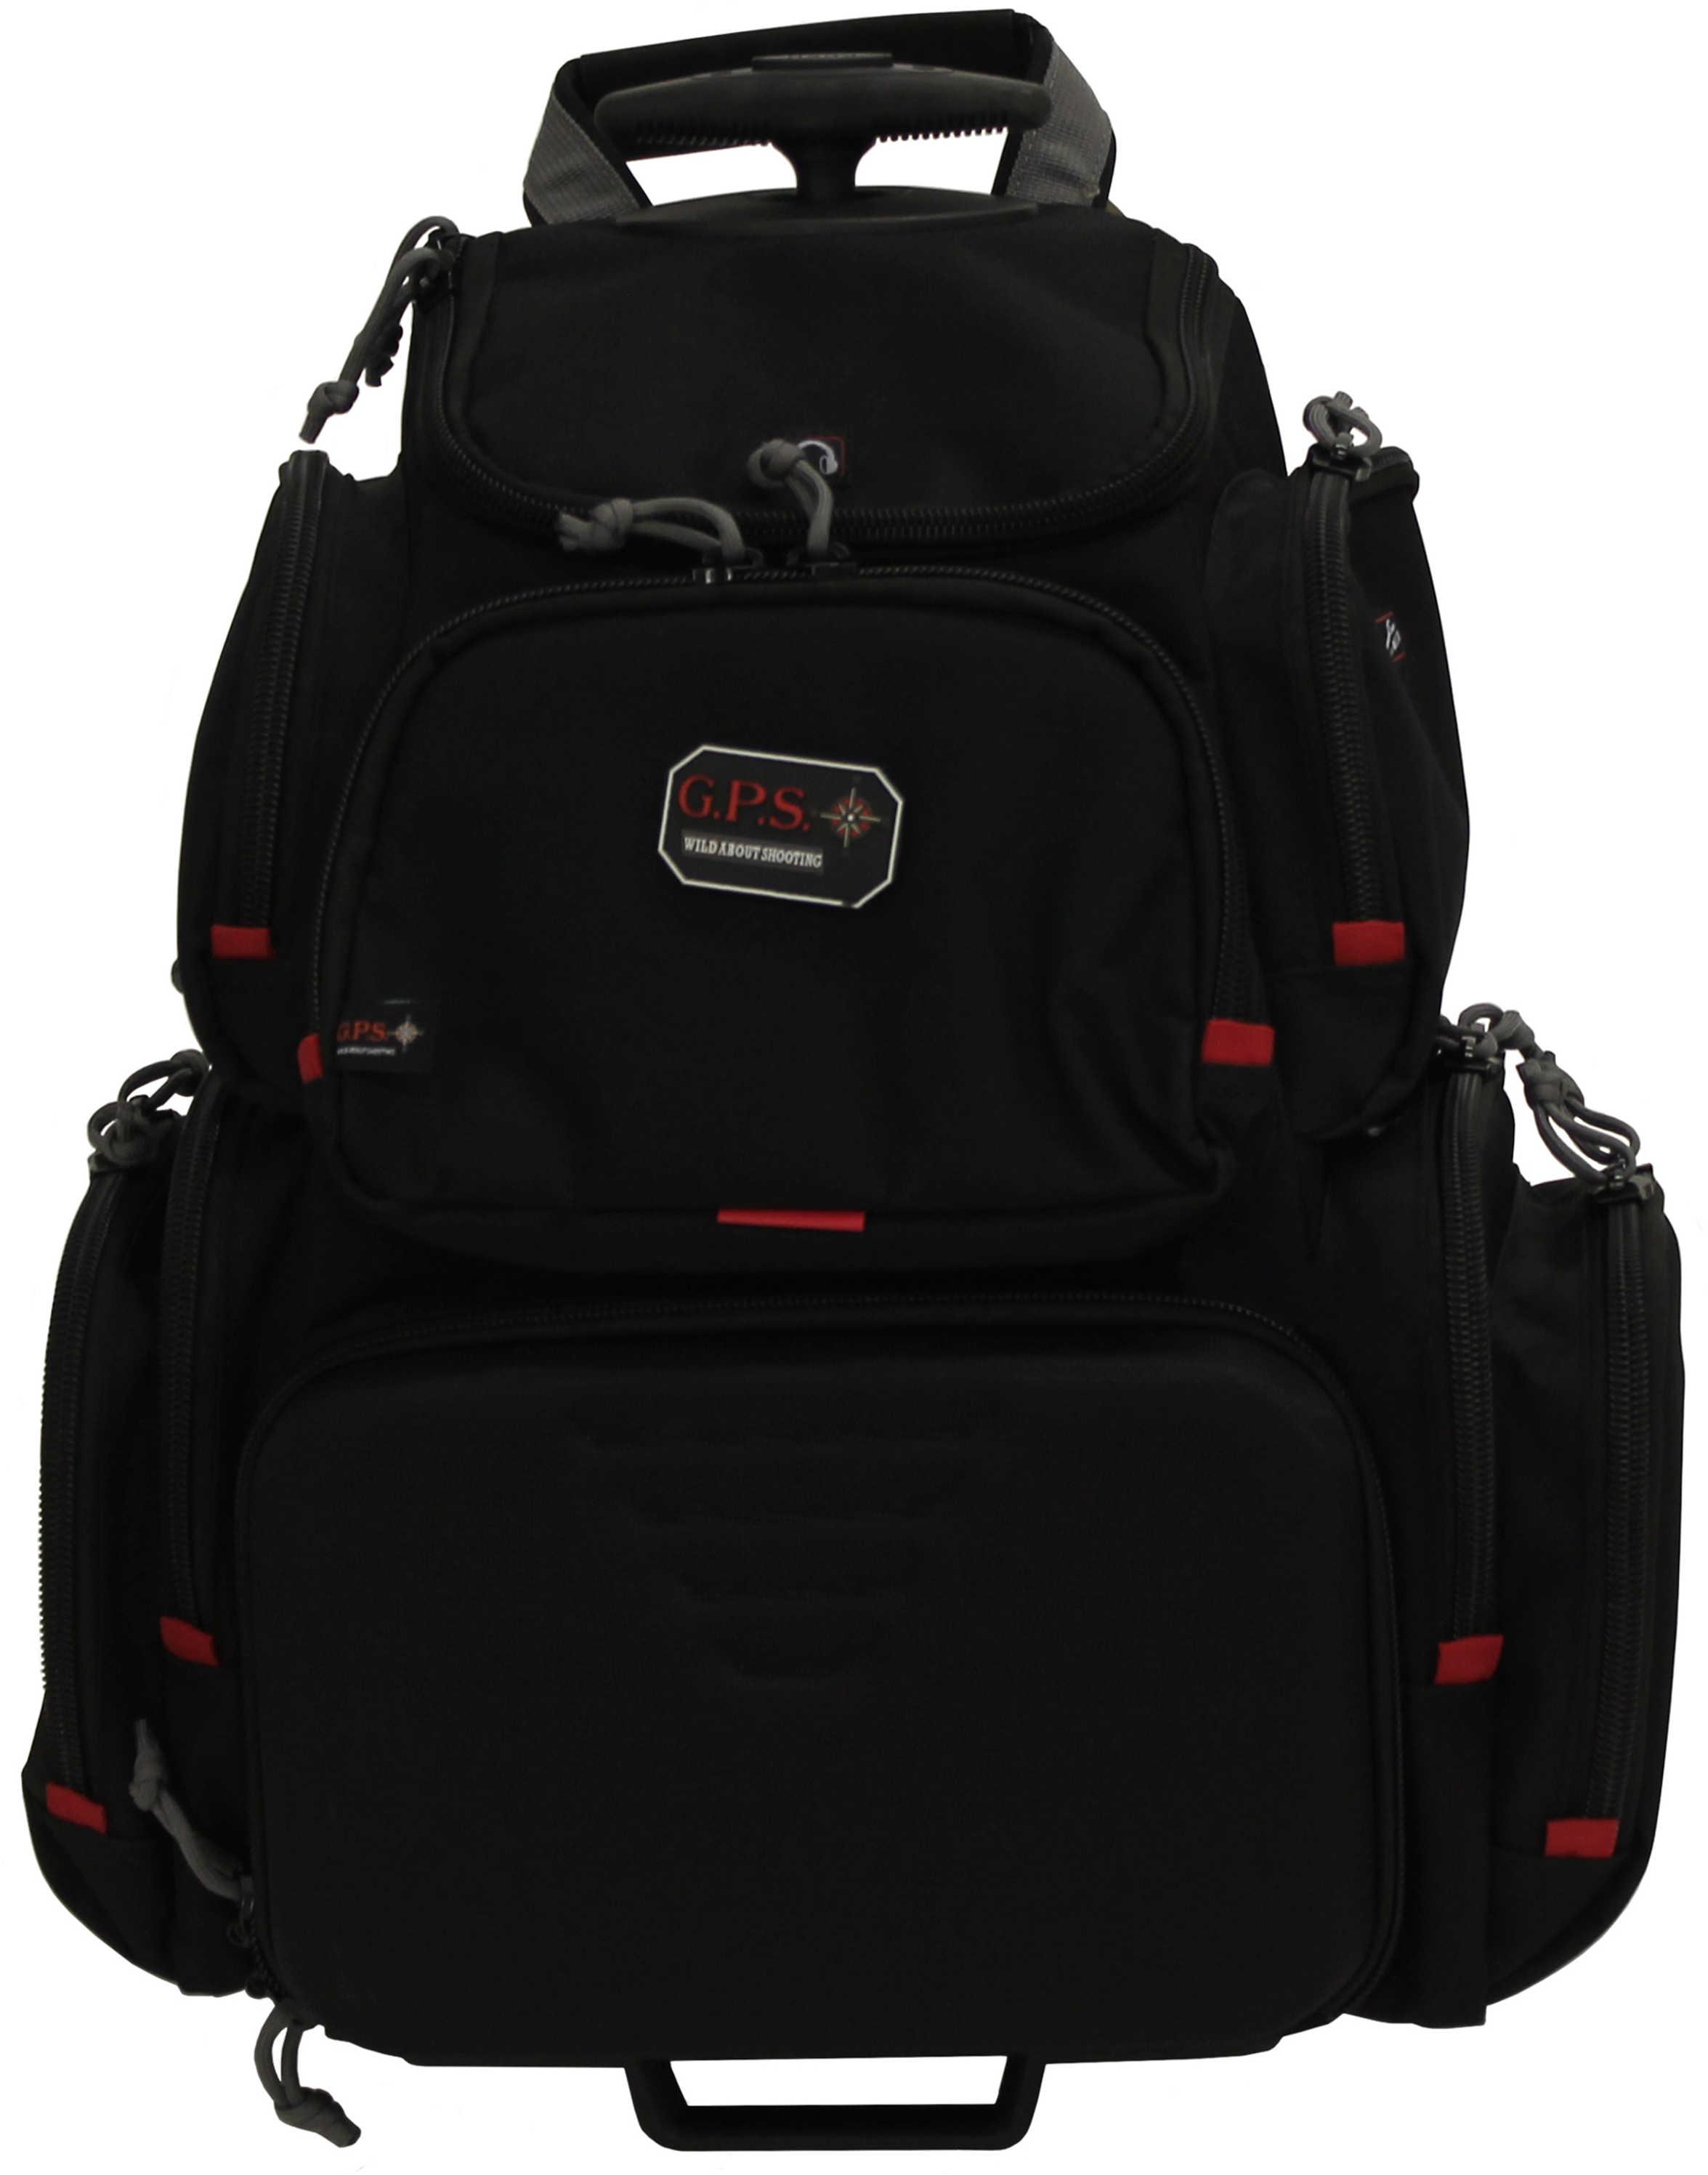 G Outdoors Inc. G Outdoors Handgunner Backpack Black Md: GPS-1711ROBP